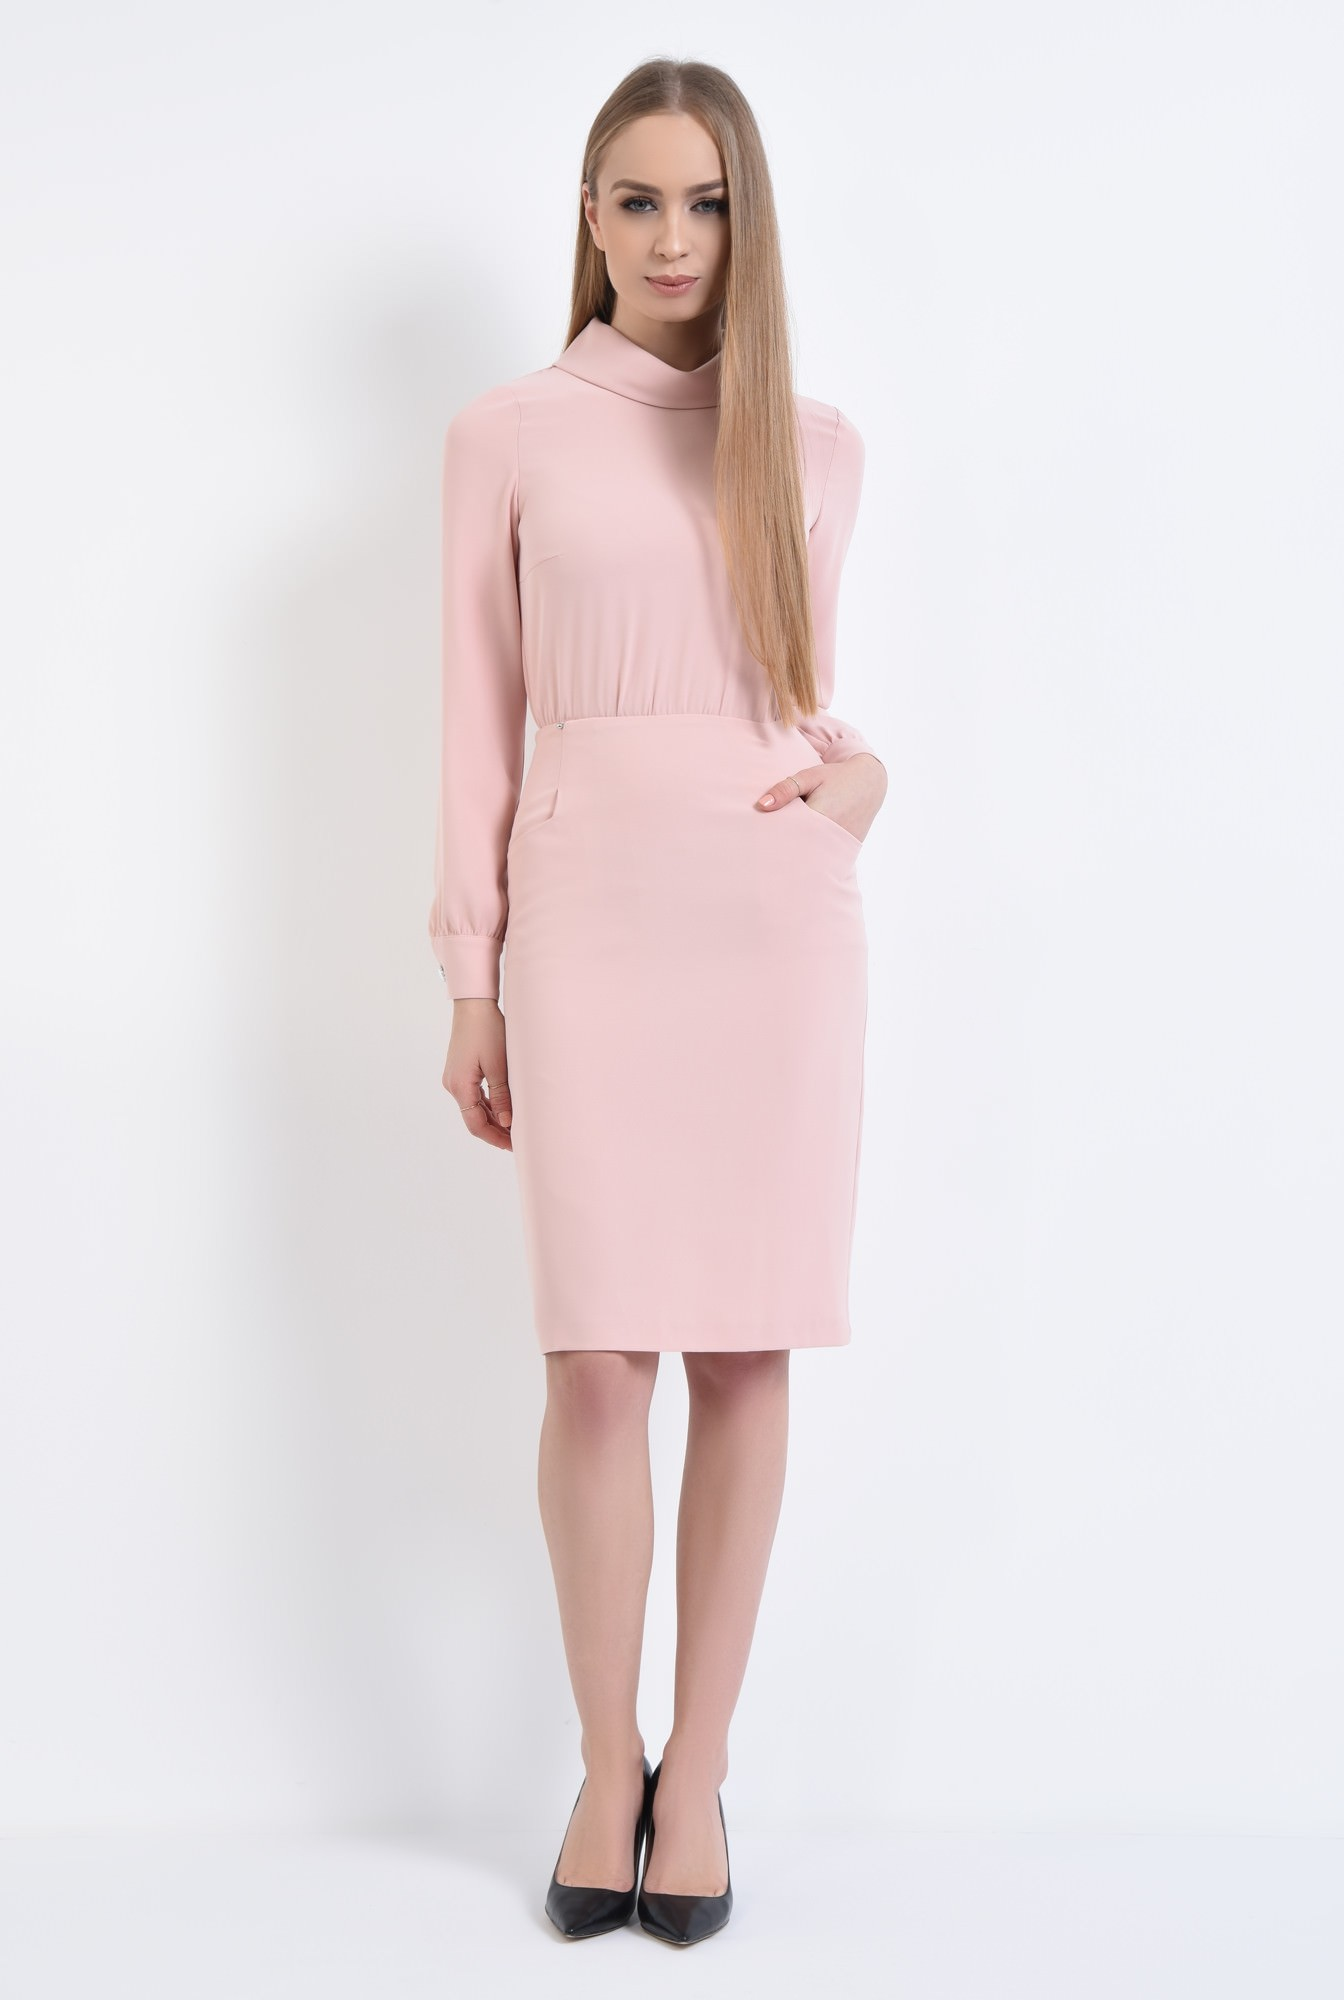 3 - Rochie casual, roz